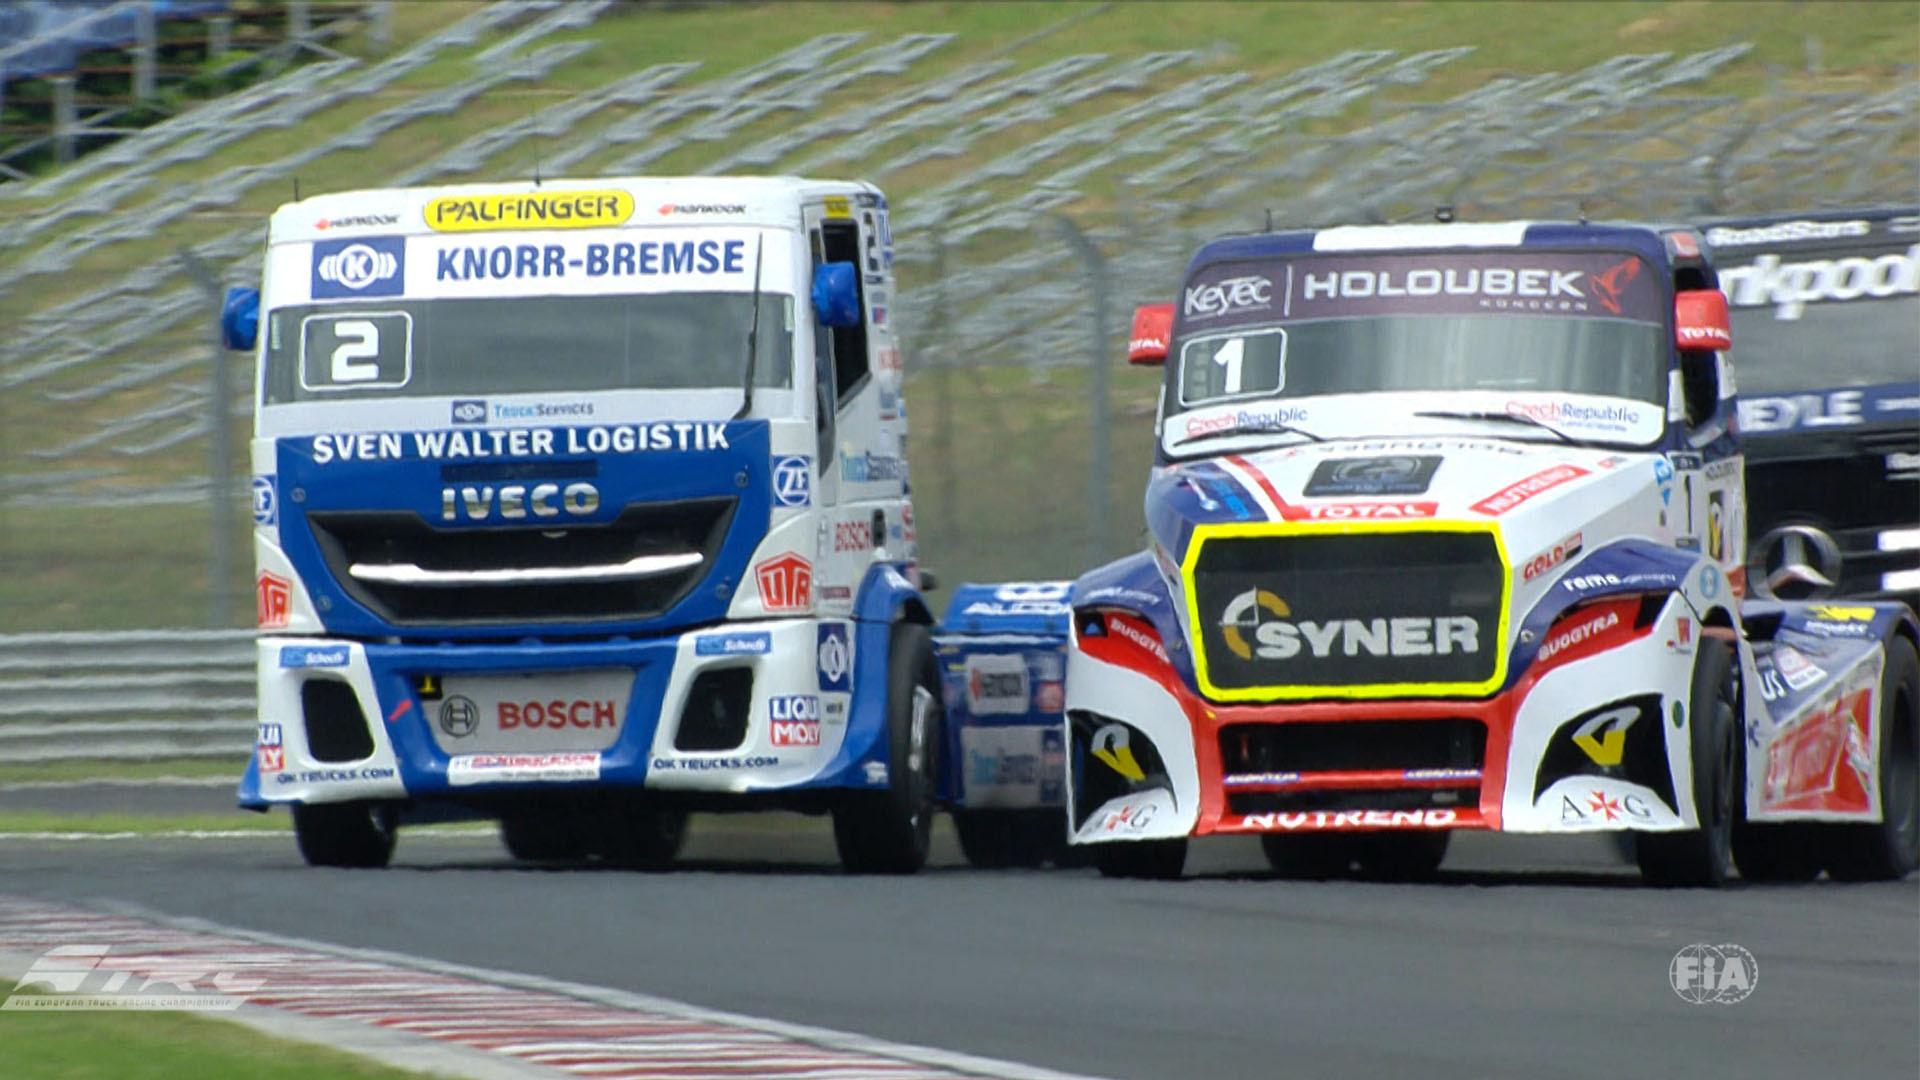 fia truck racing championship wallpaper 68386